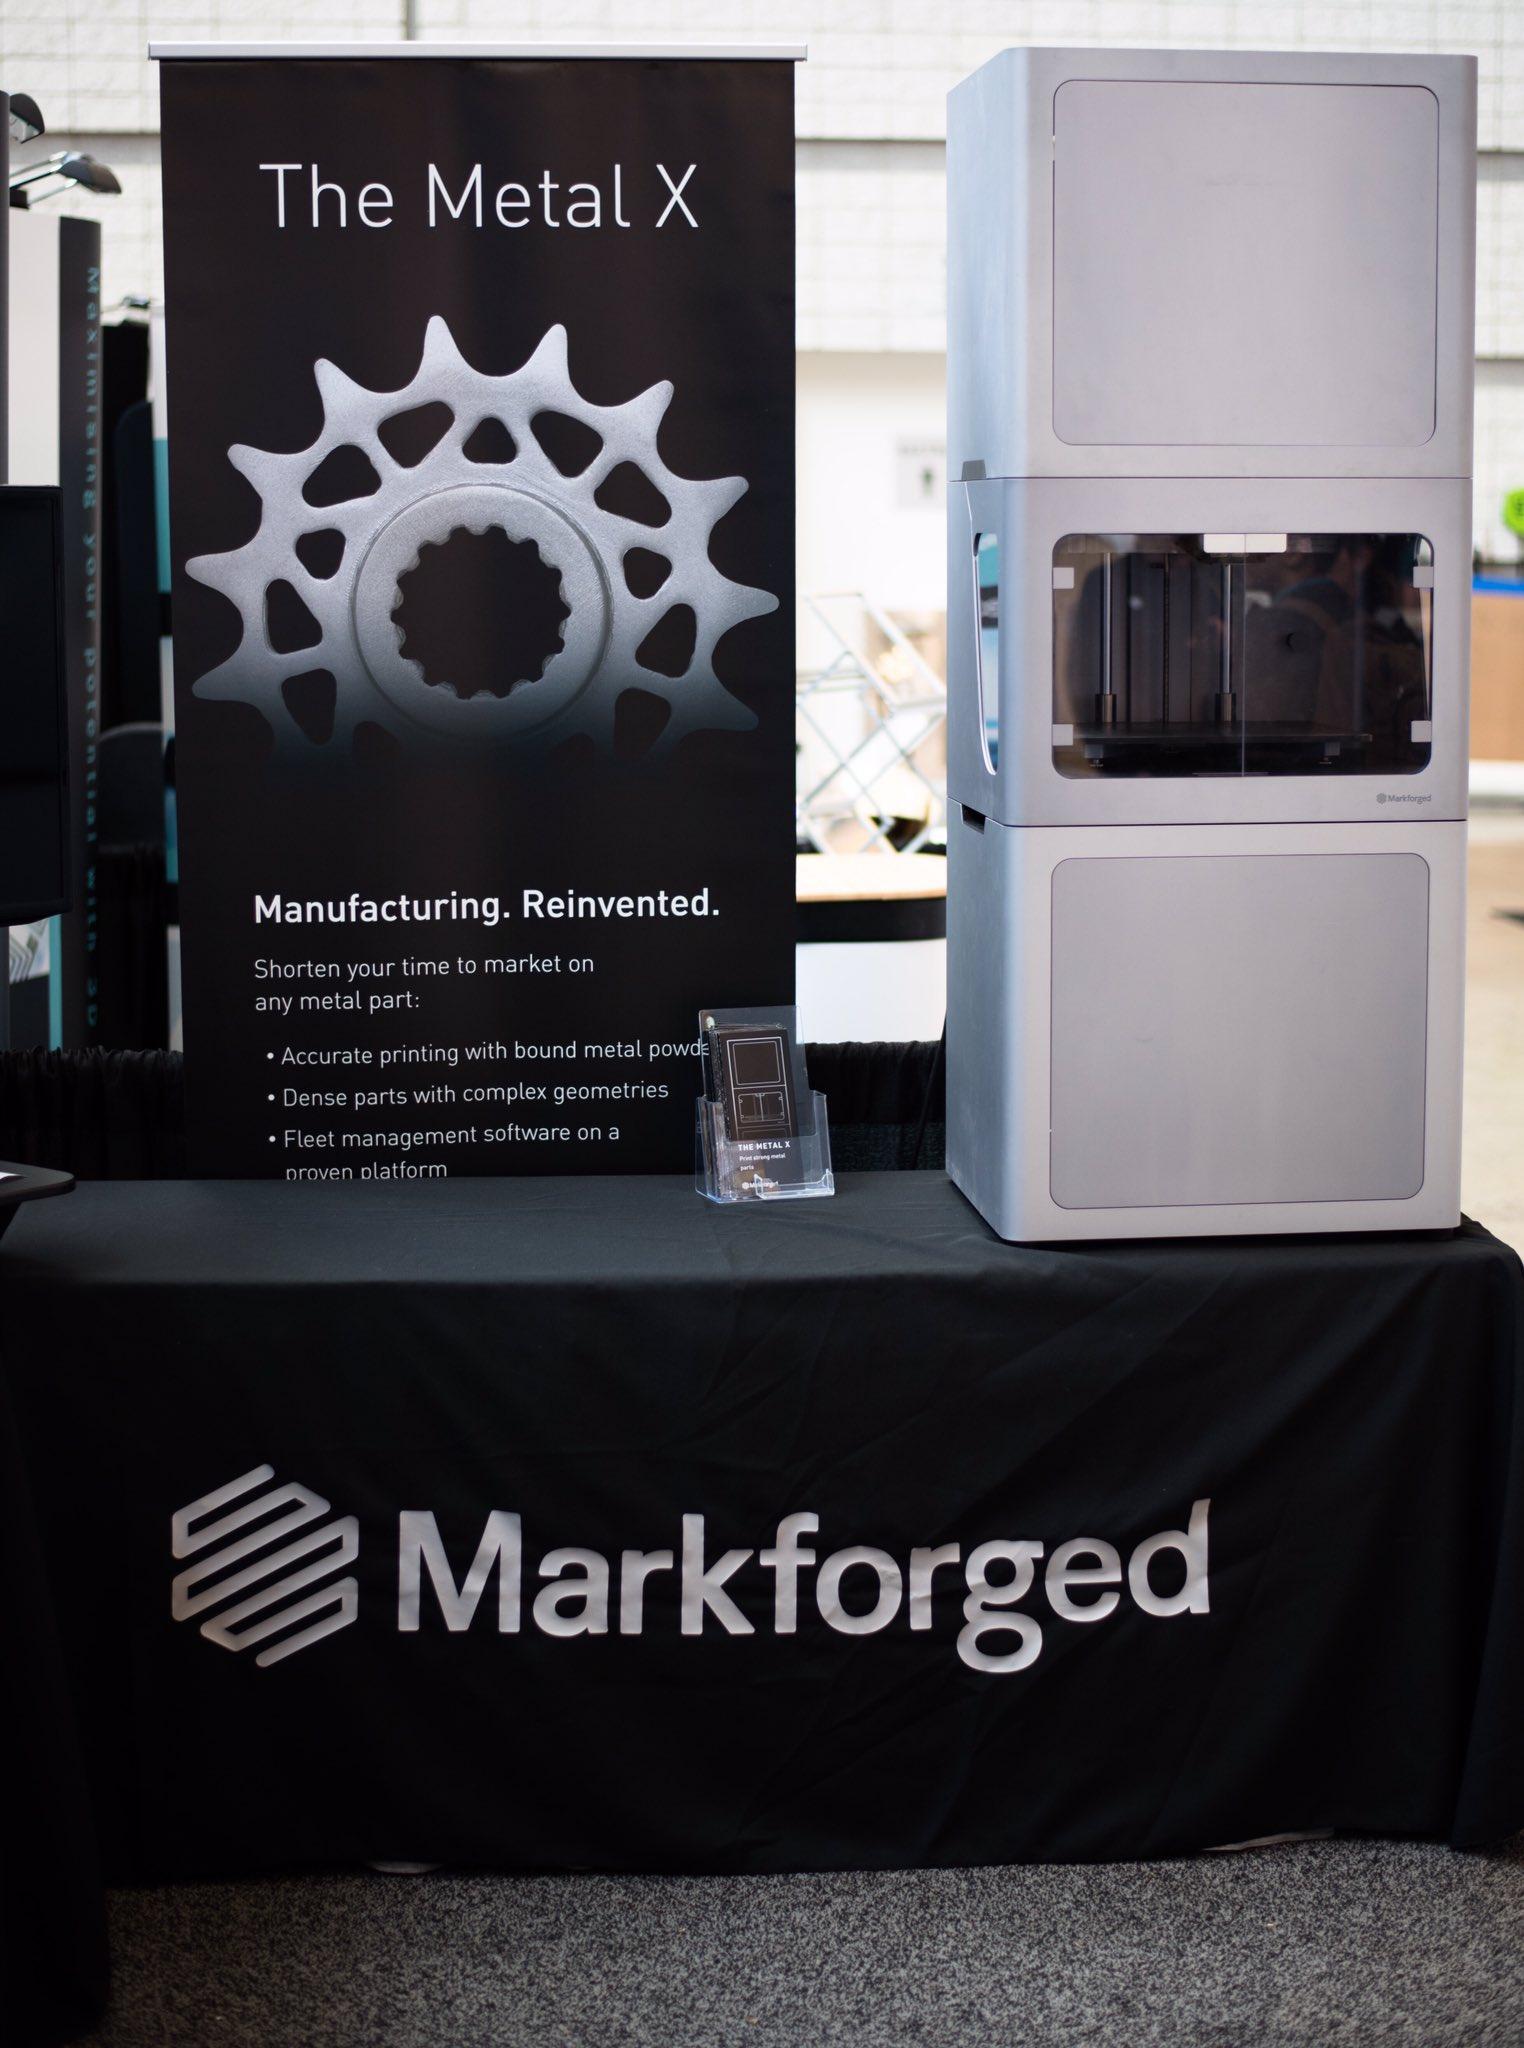 Markforged displays its forthcoming Metal X 3D printer at RAPID + TCT 2017. Photo via Markforged.